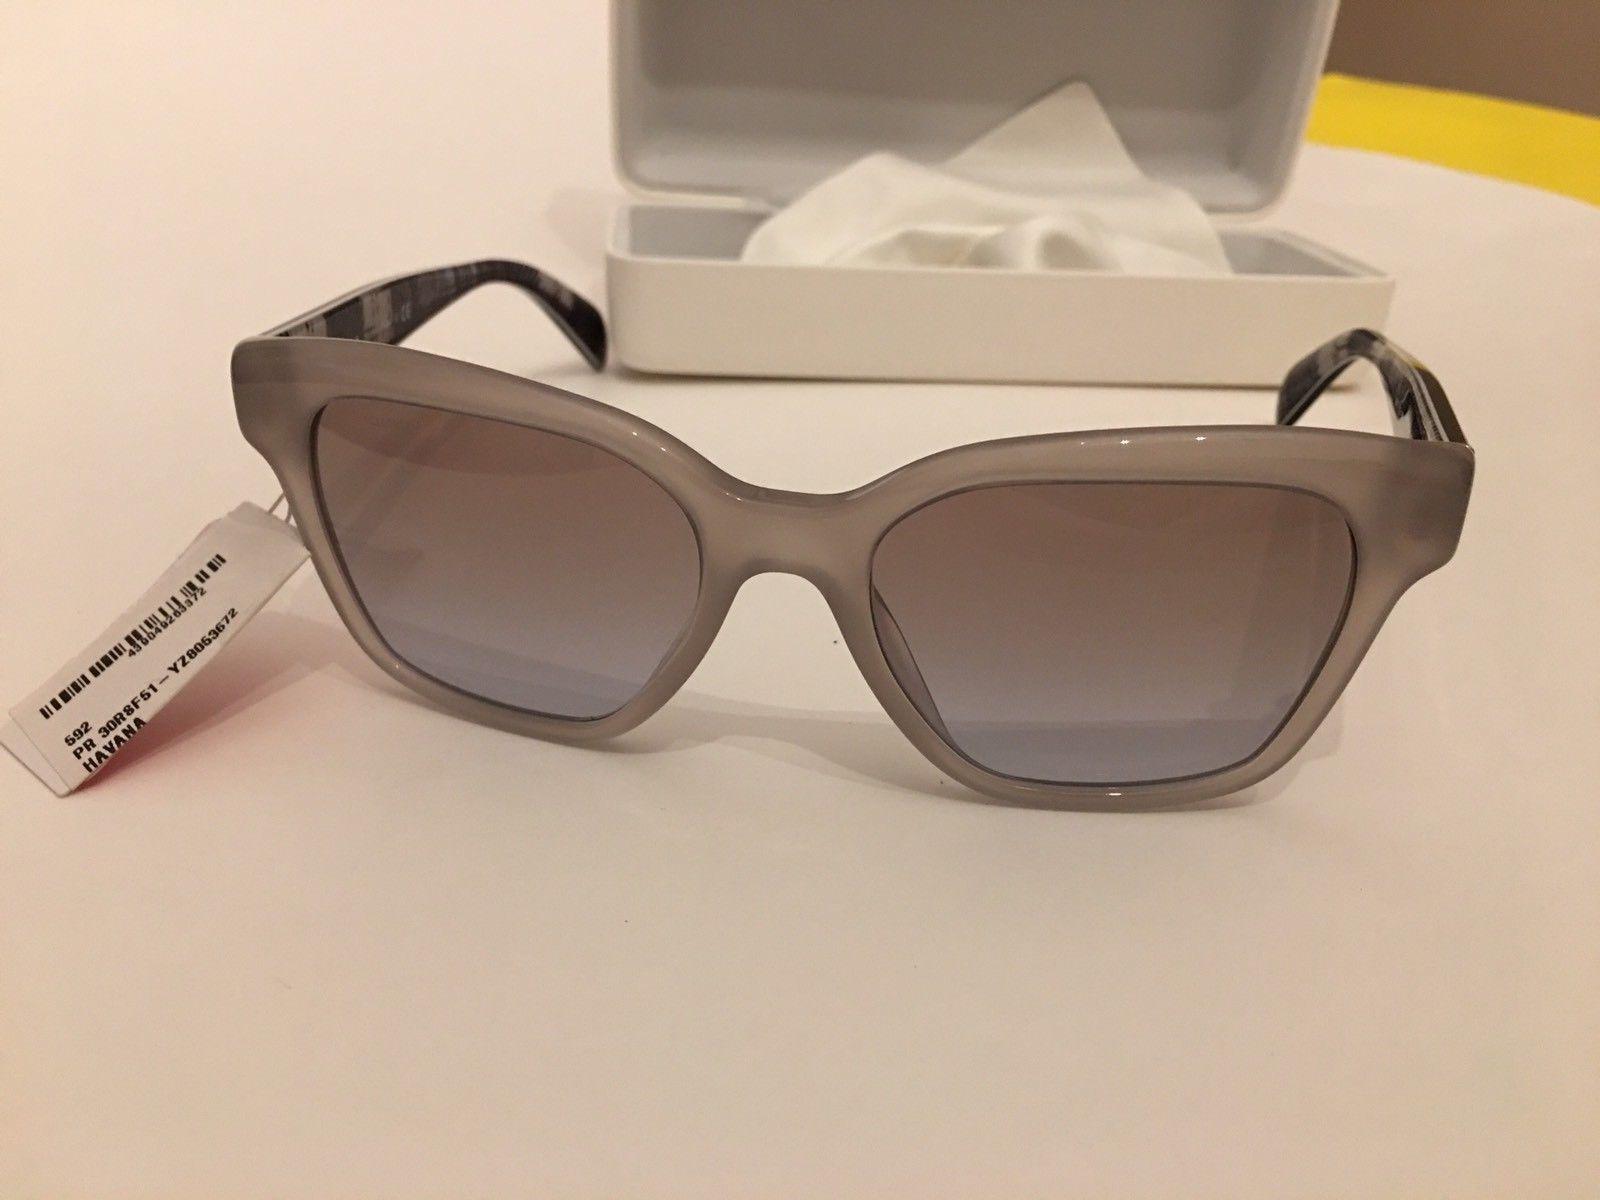 7a8d63ad65 Prada Sunglasses Gray w  Gradient Gray and similar items